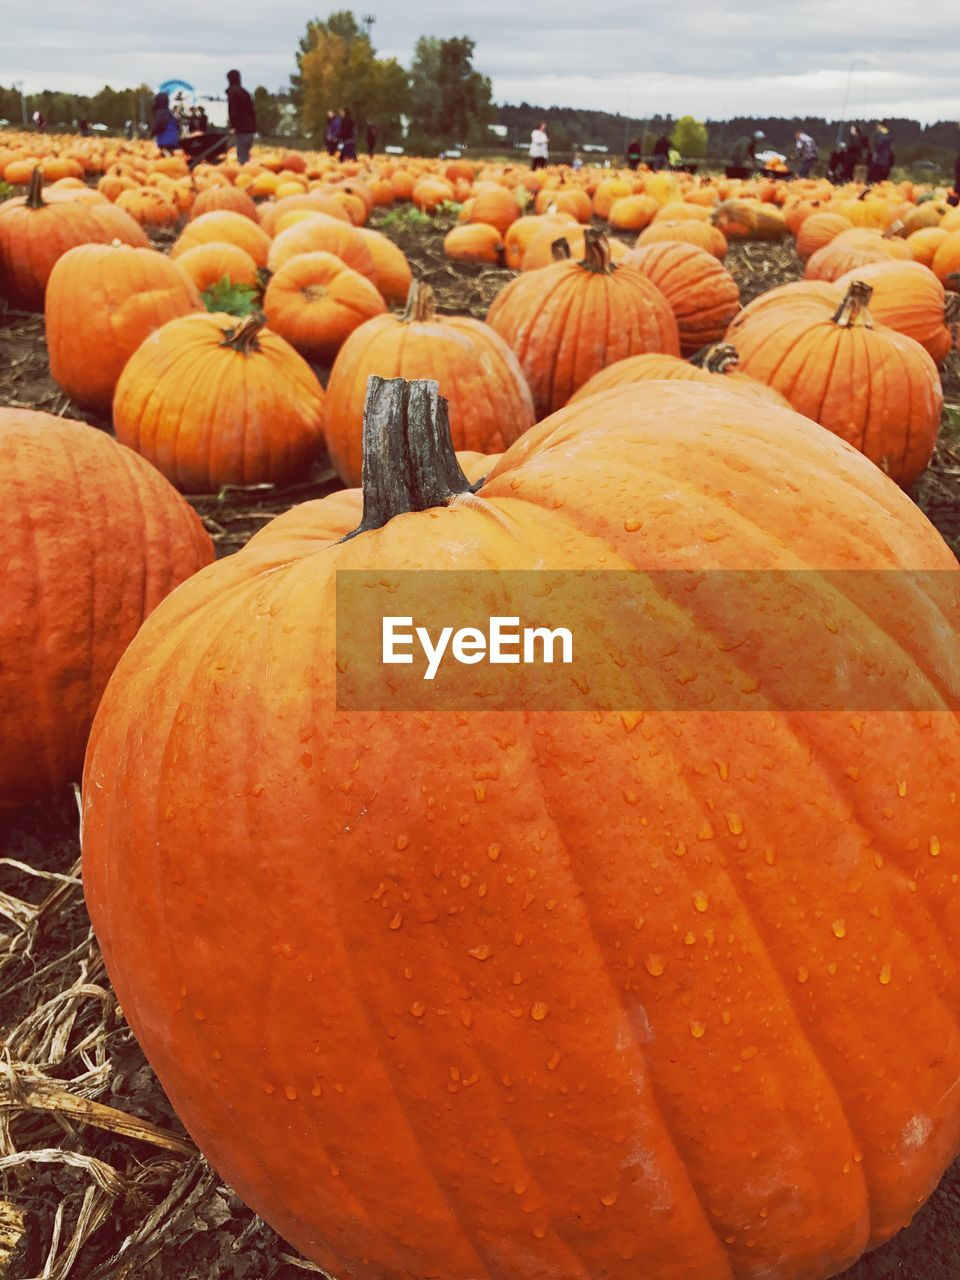 pumpkin, halloween, orange color, food and drink, vegetable, no people, food, day, field, abundance, outdoors, freshness, jack o lantern, healthy eating, close-up, nature